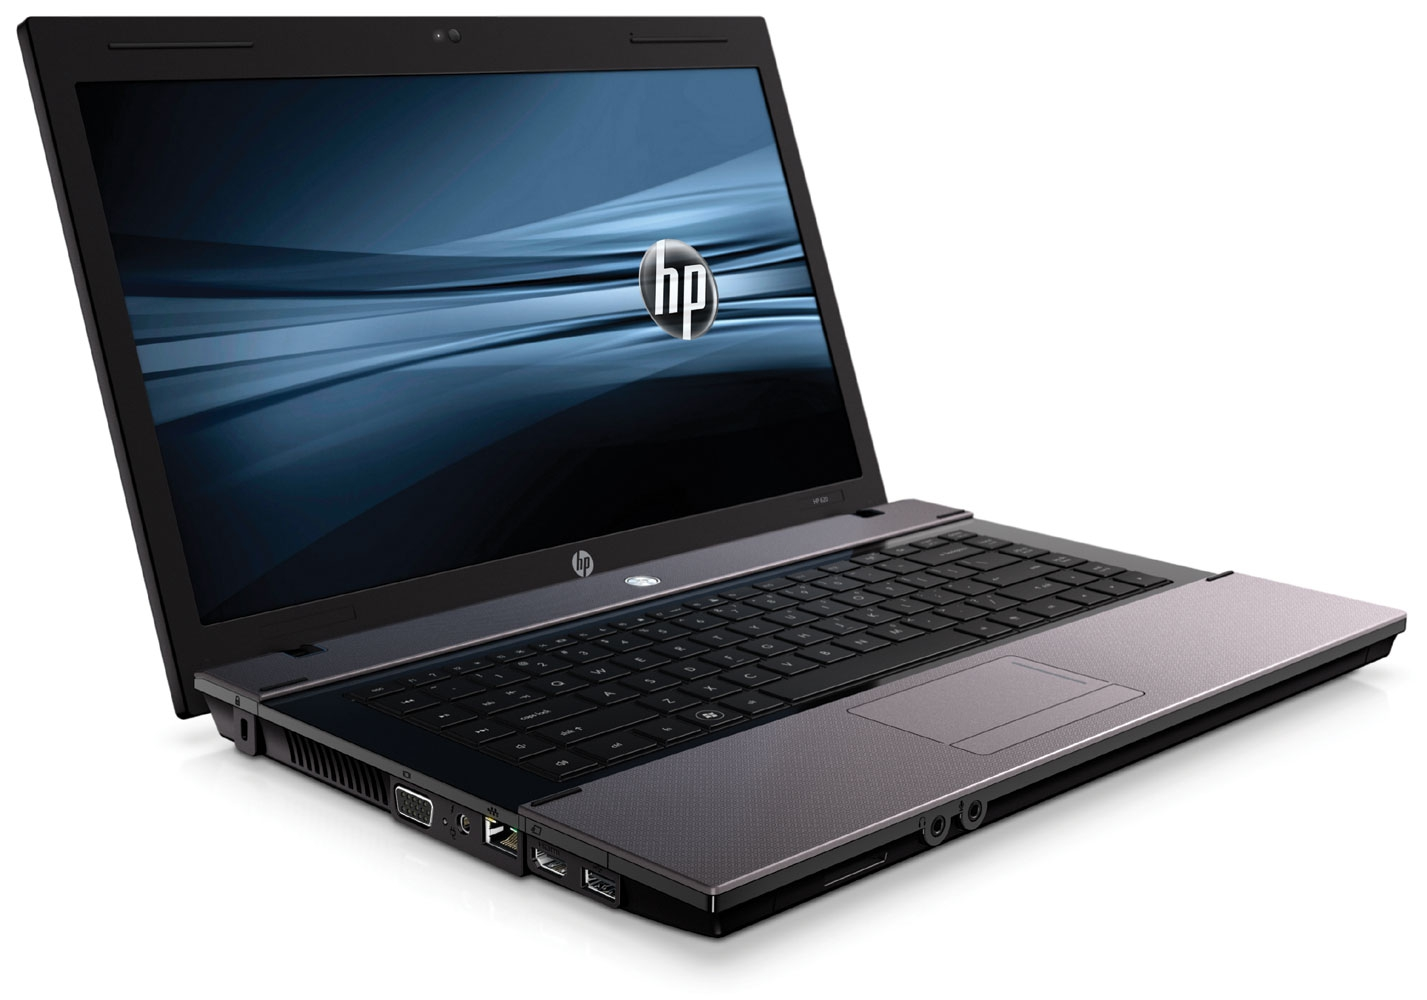 HP Compaq nx9030 Notebook Download Driver